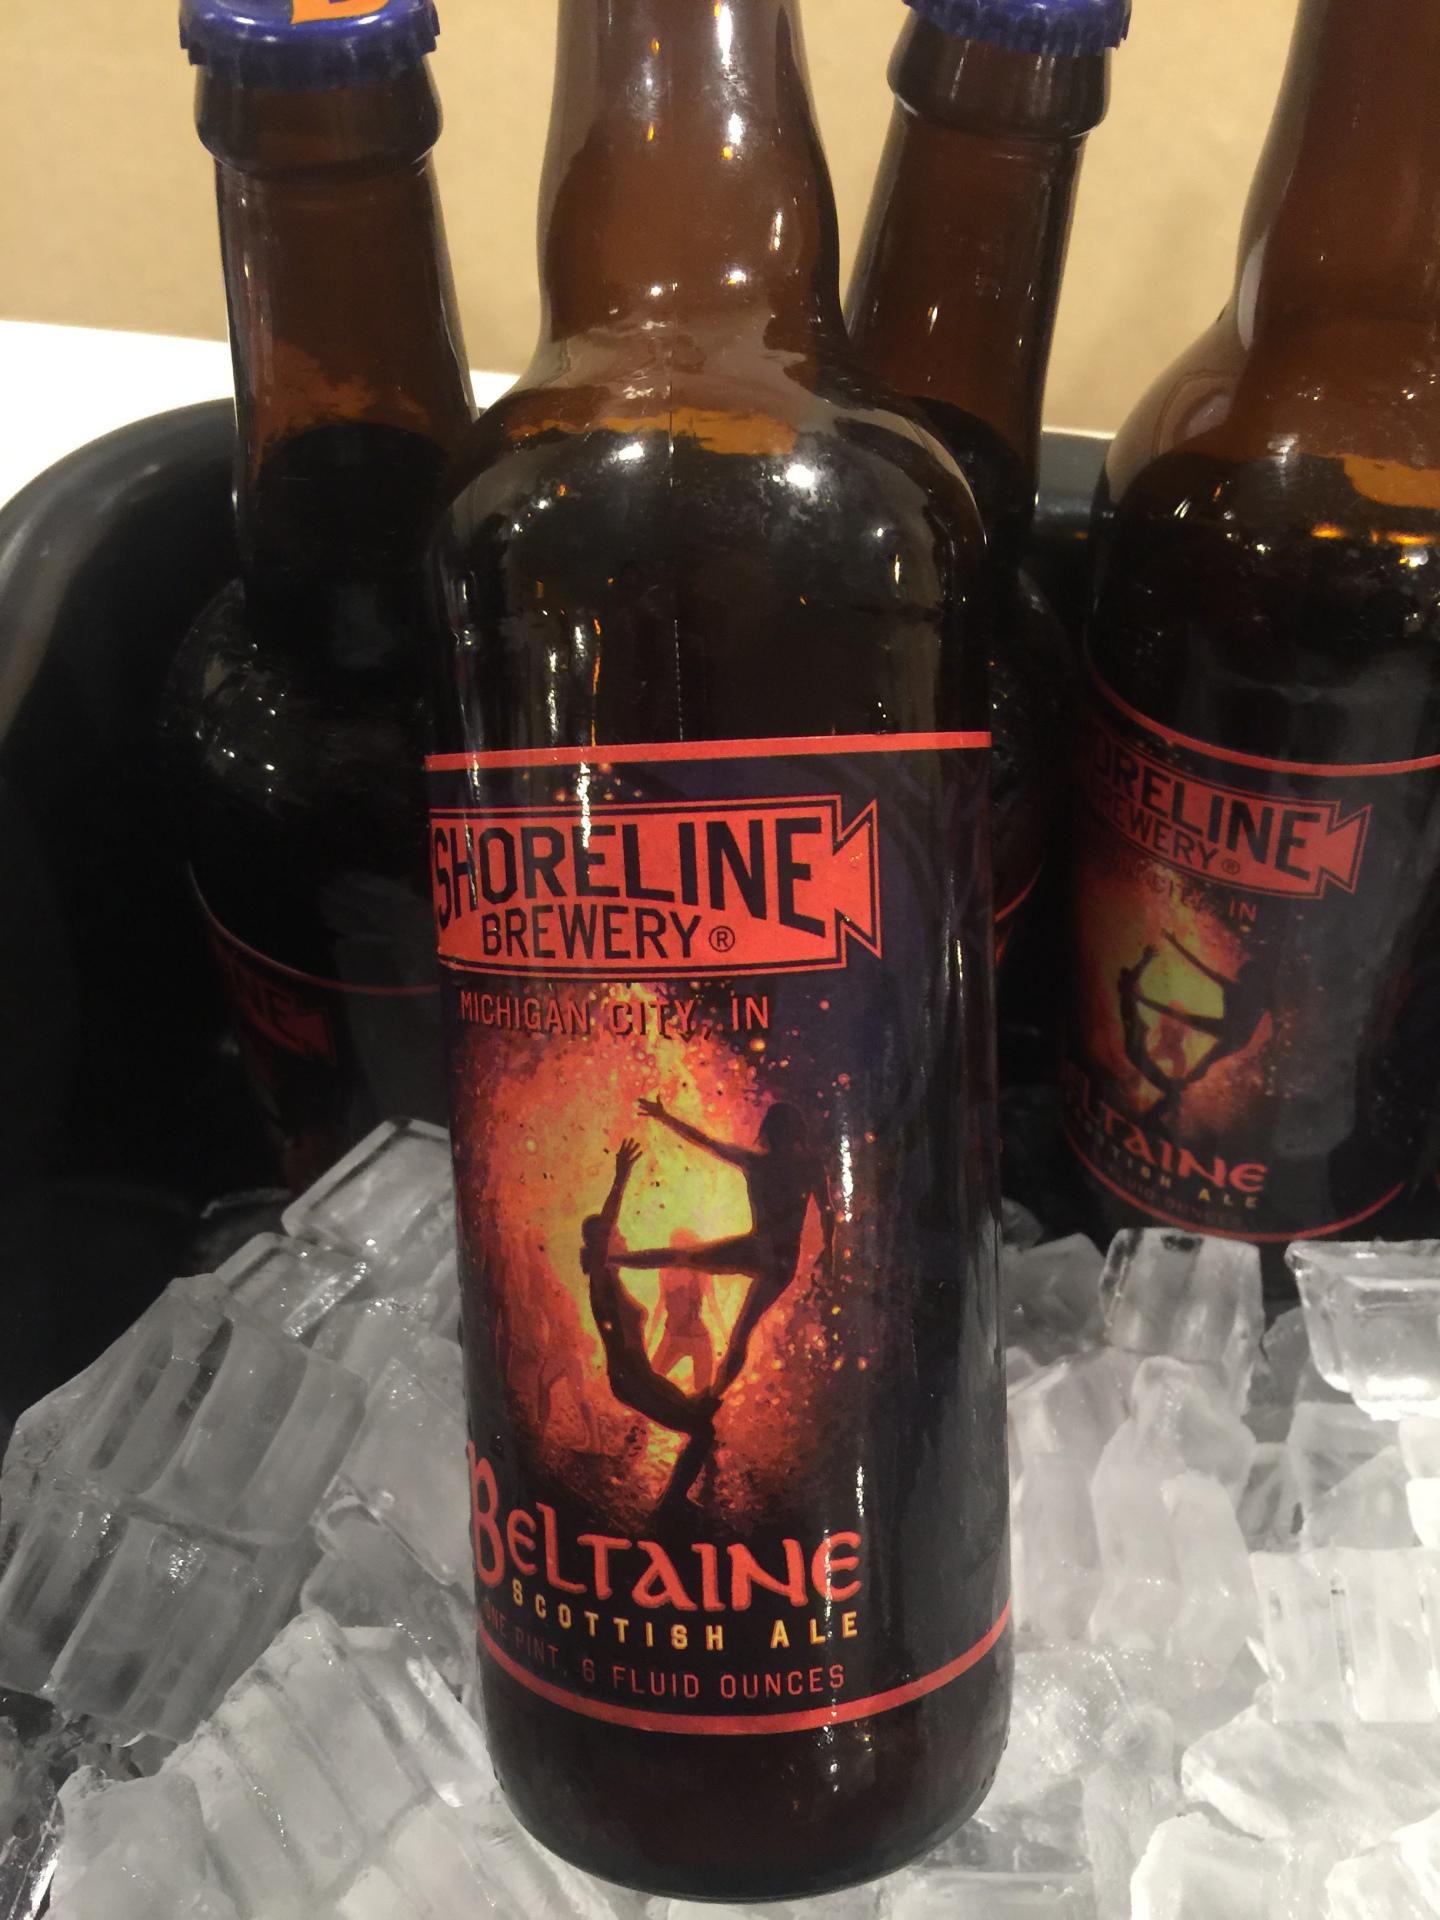 Shoreline Brewery, Craft Beer Porn, Craft Beer Insurance